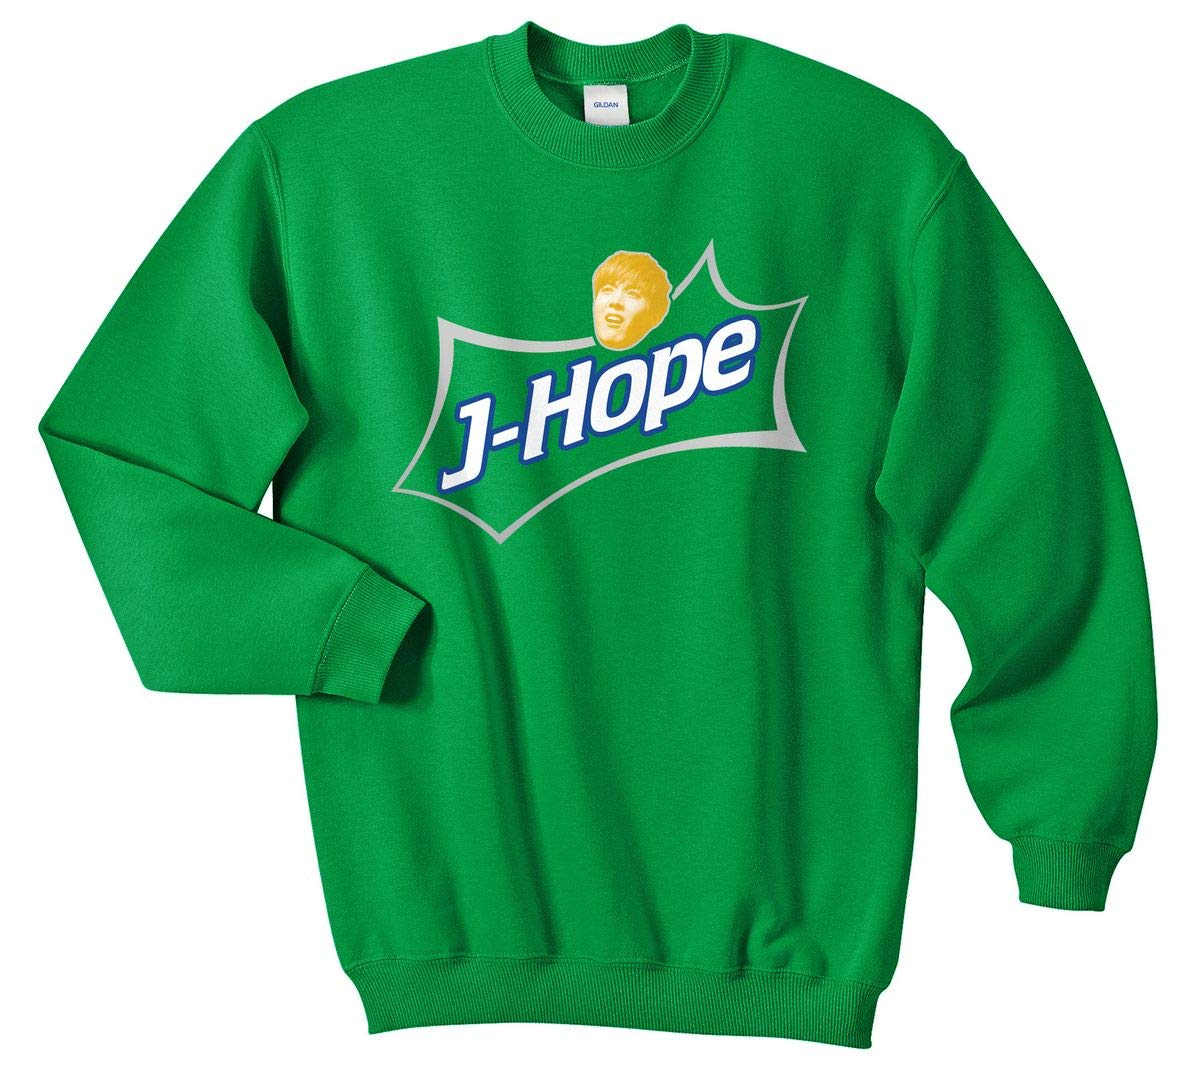 Sanfran Clothing J-Hope Soda Funny Meme K-pop Kpop JHope Love Yourself Jumper Sweater